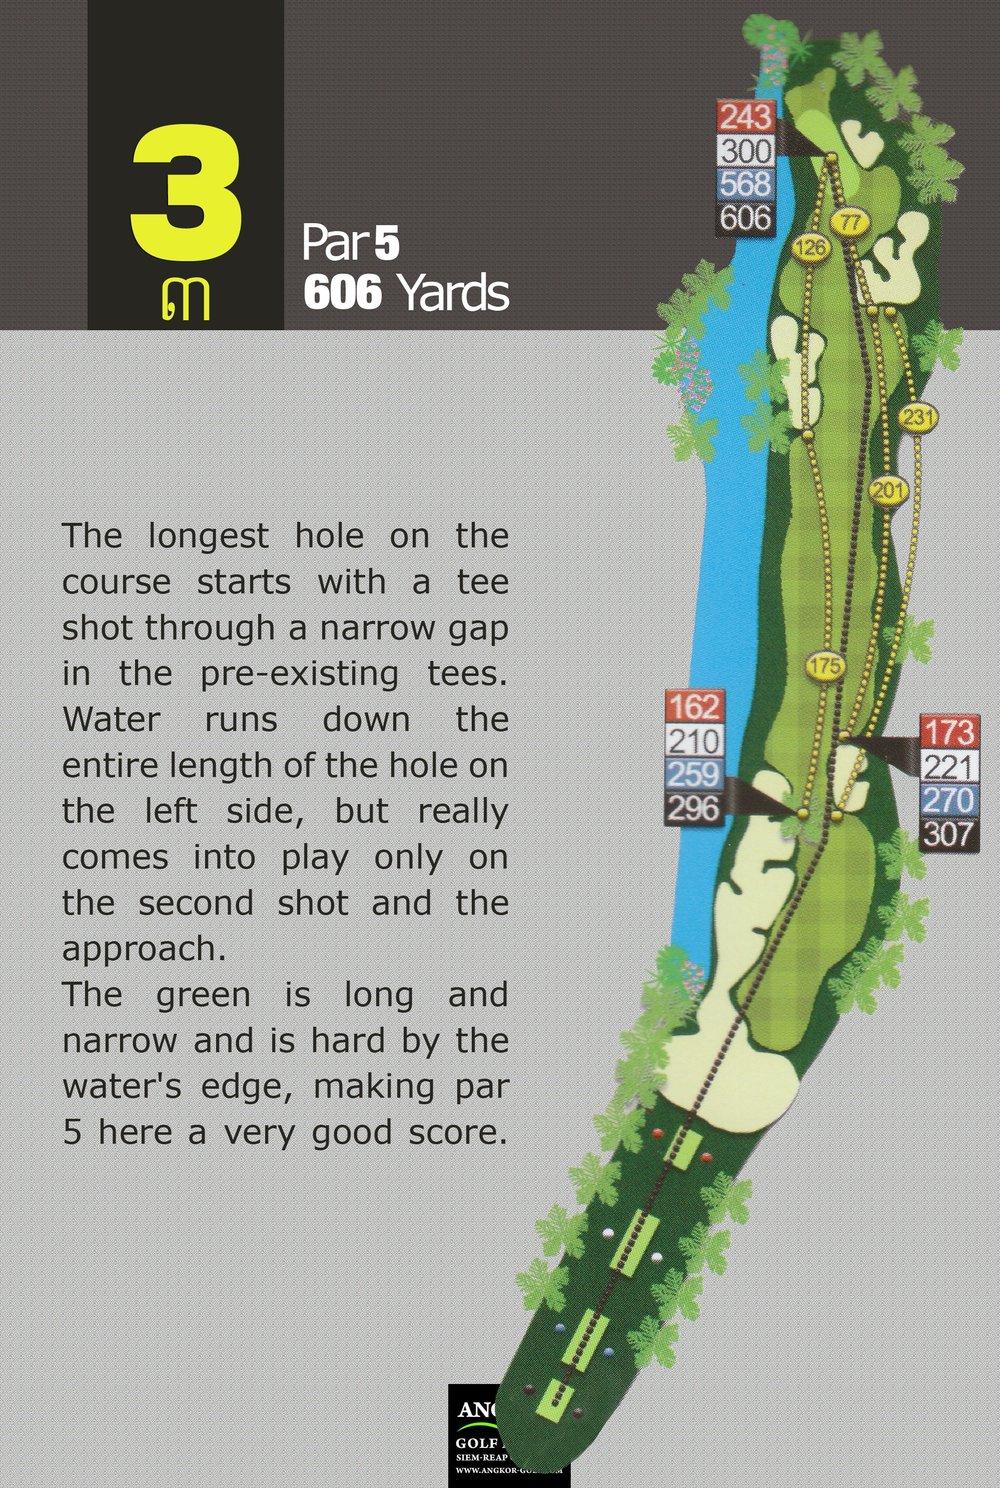 Hole 3 - Par 5 606 Yards